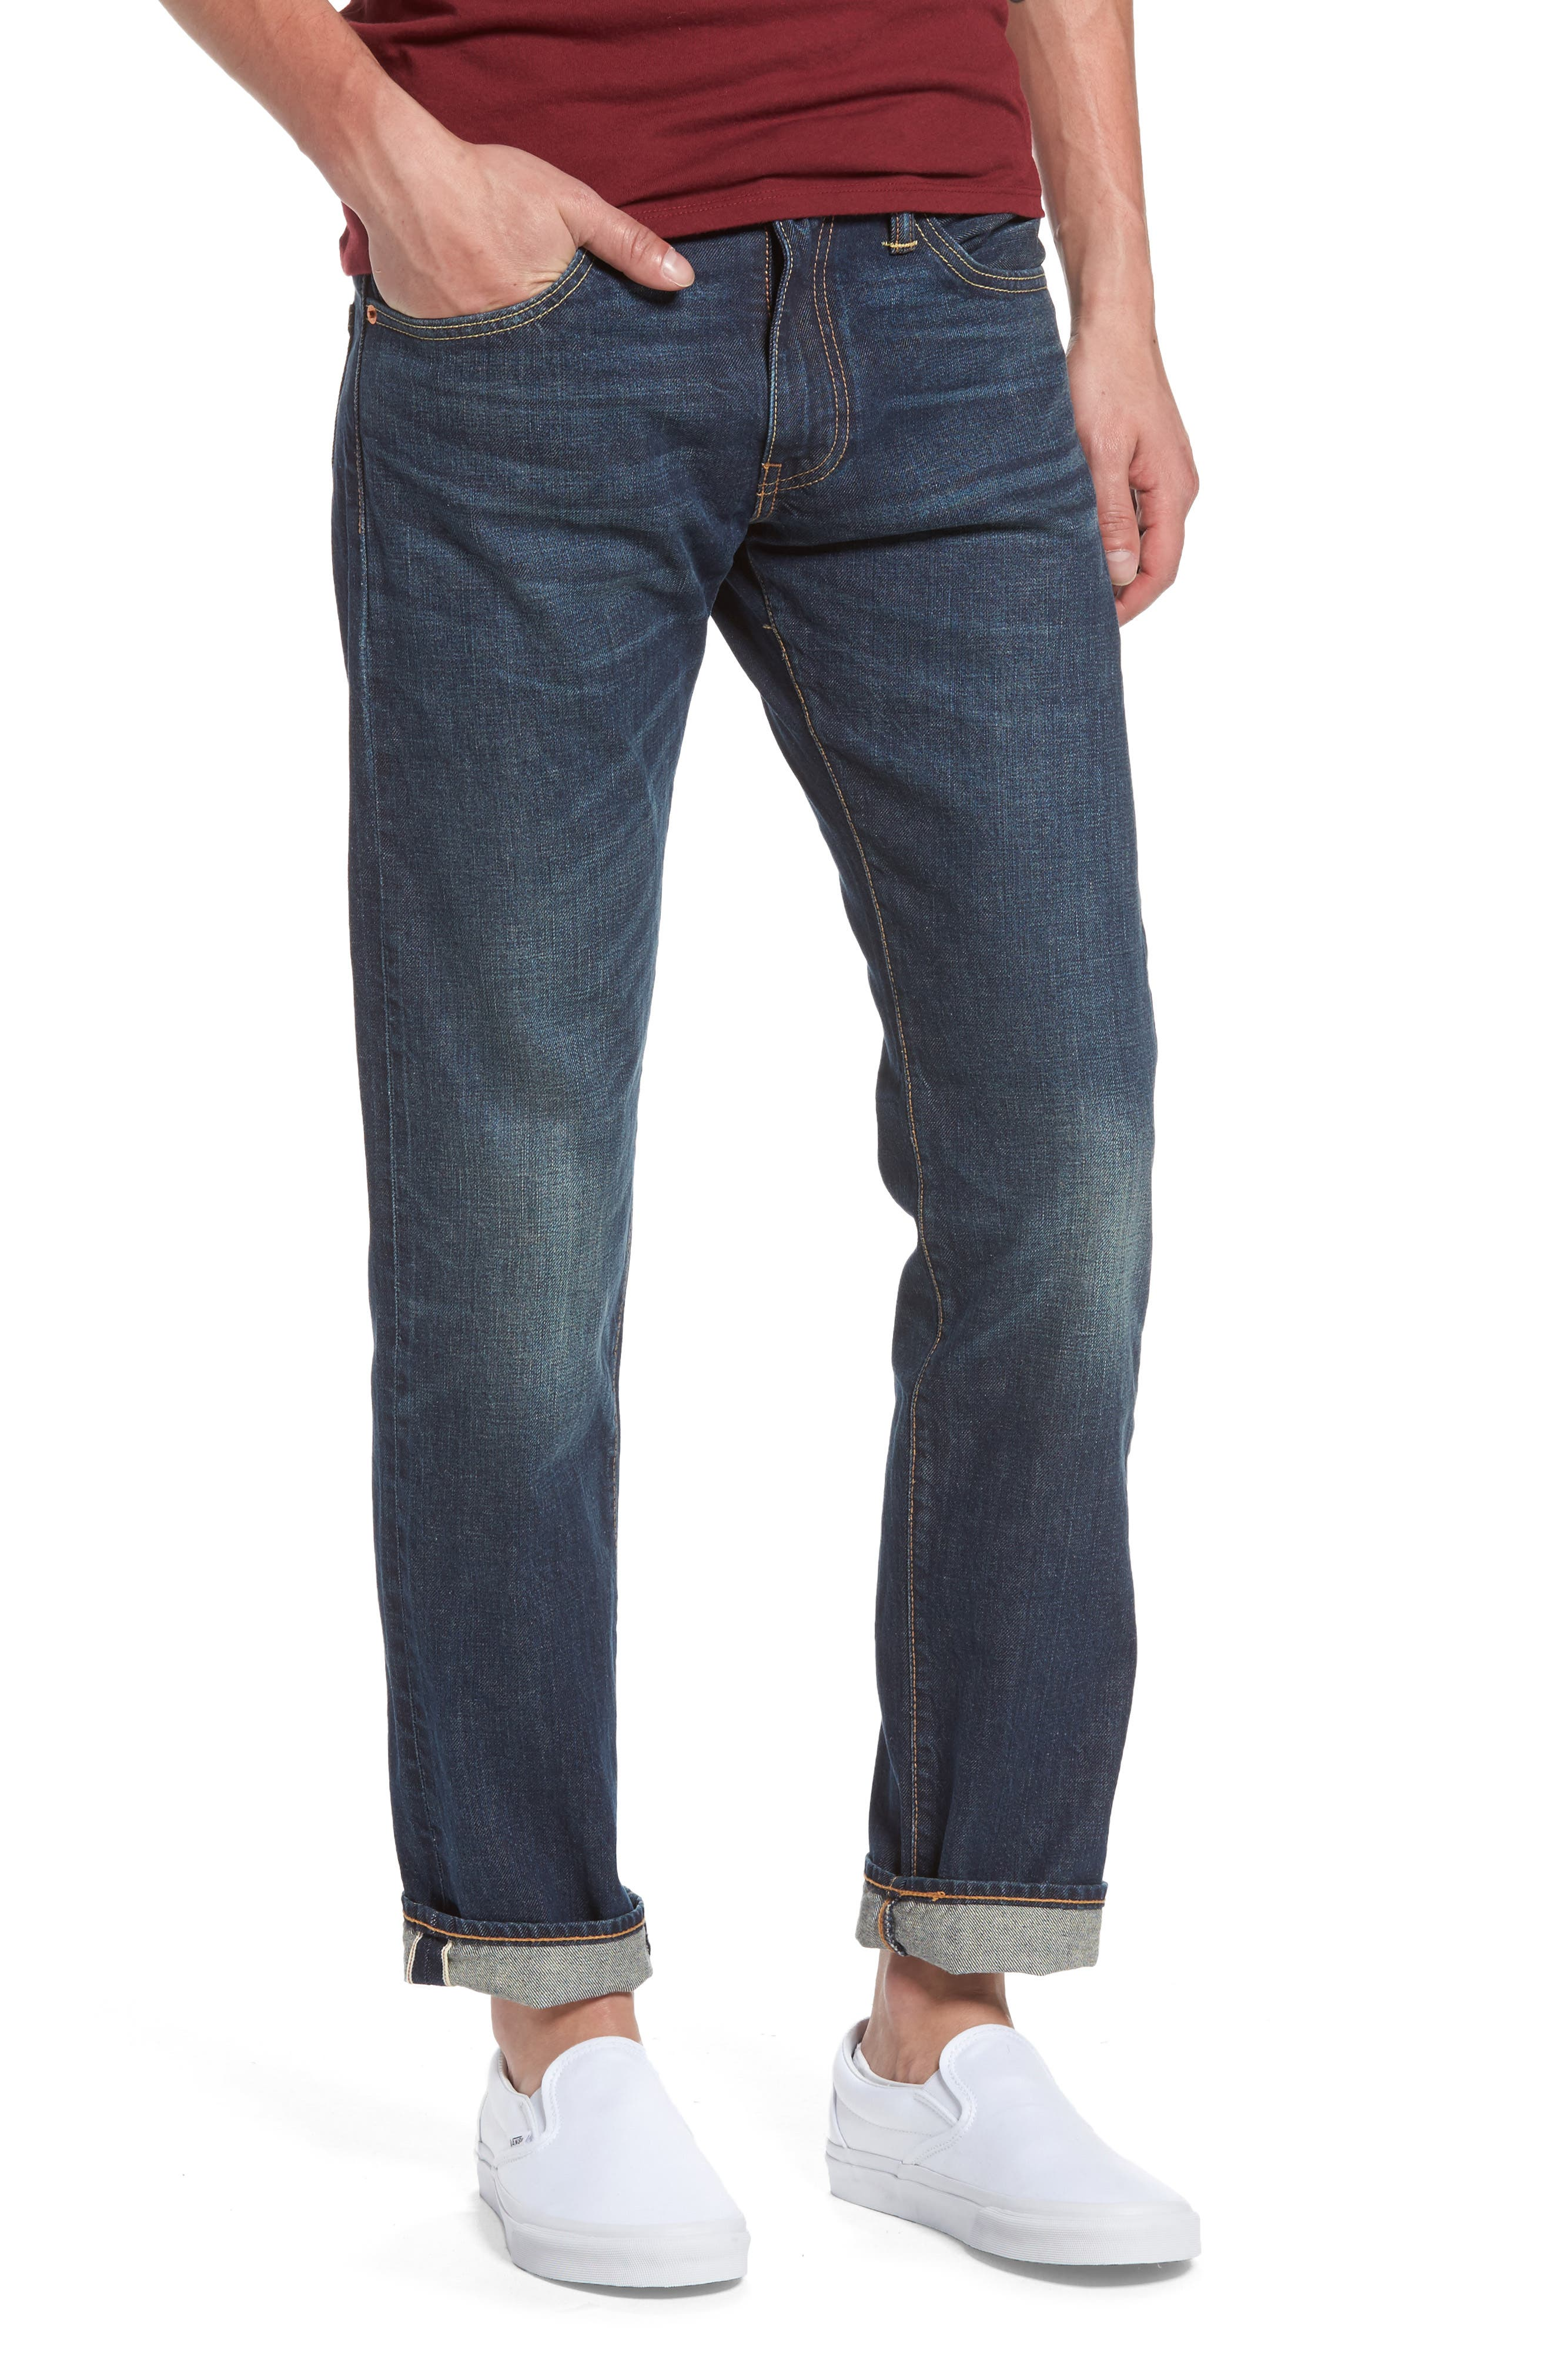 511<sup>™</sup> Slim Fit Jeans,                             Main thumbnail 1, color,                             425